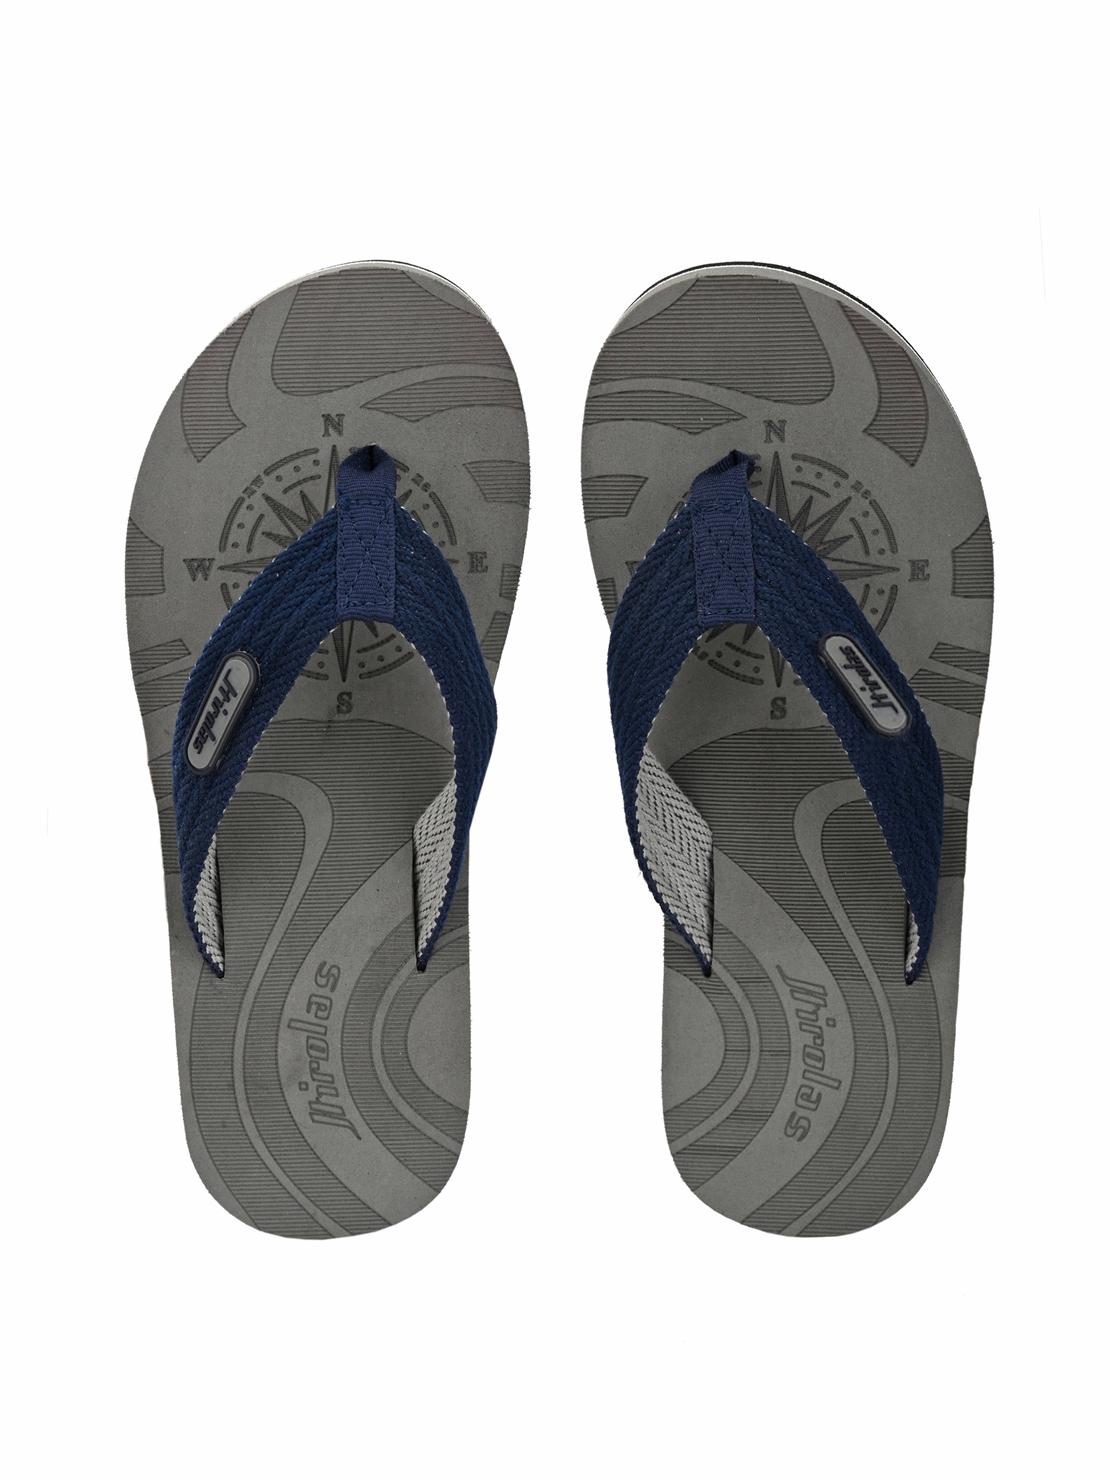 Hirolas | Hirolas Fabrication laser design Flip-Flop Slippers - Grey